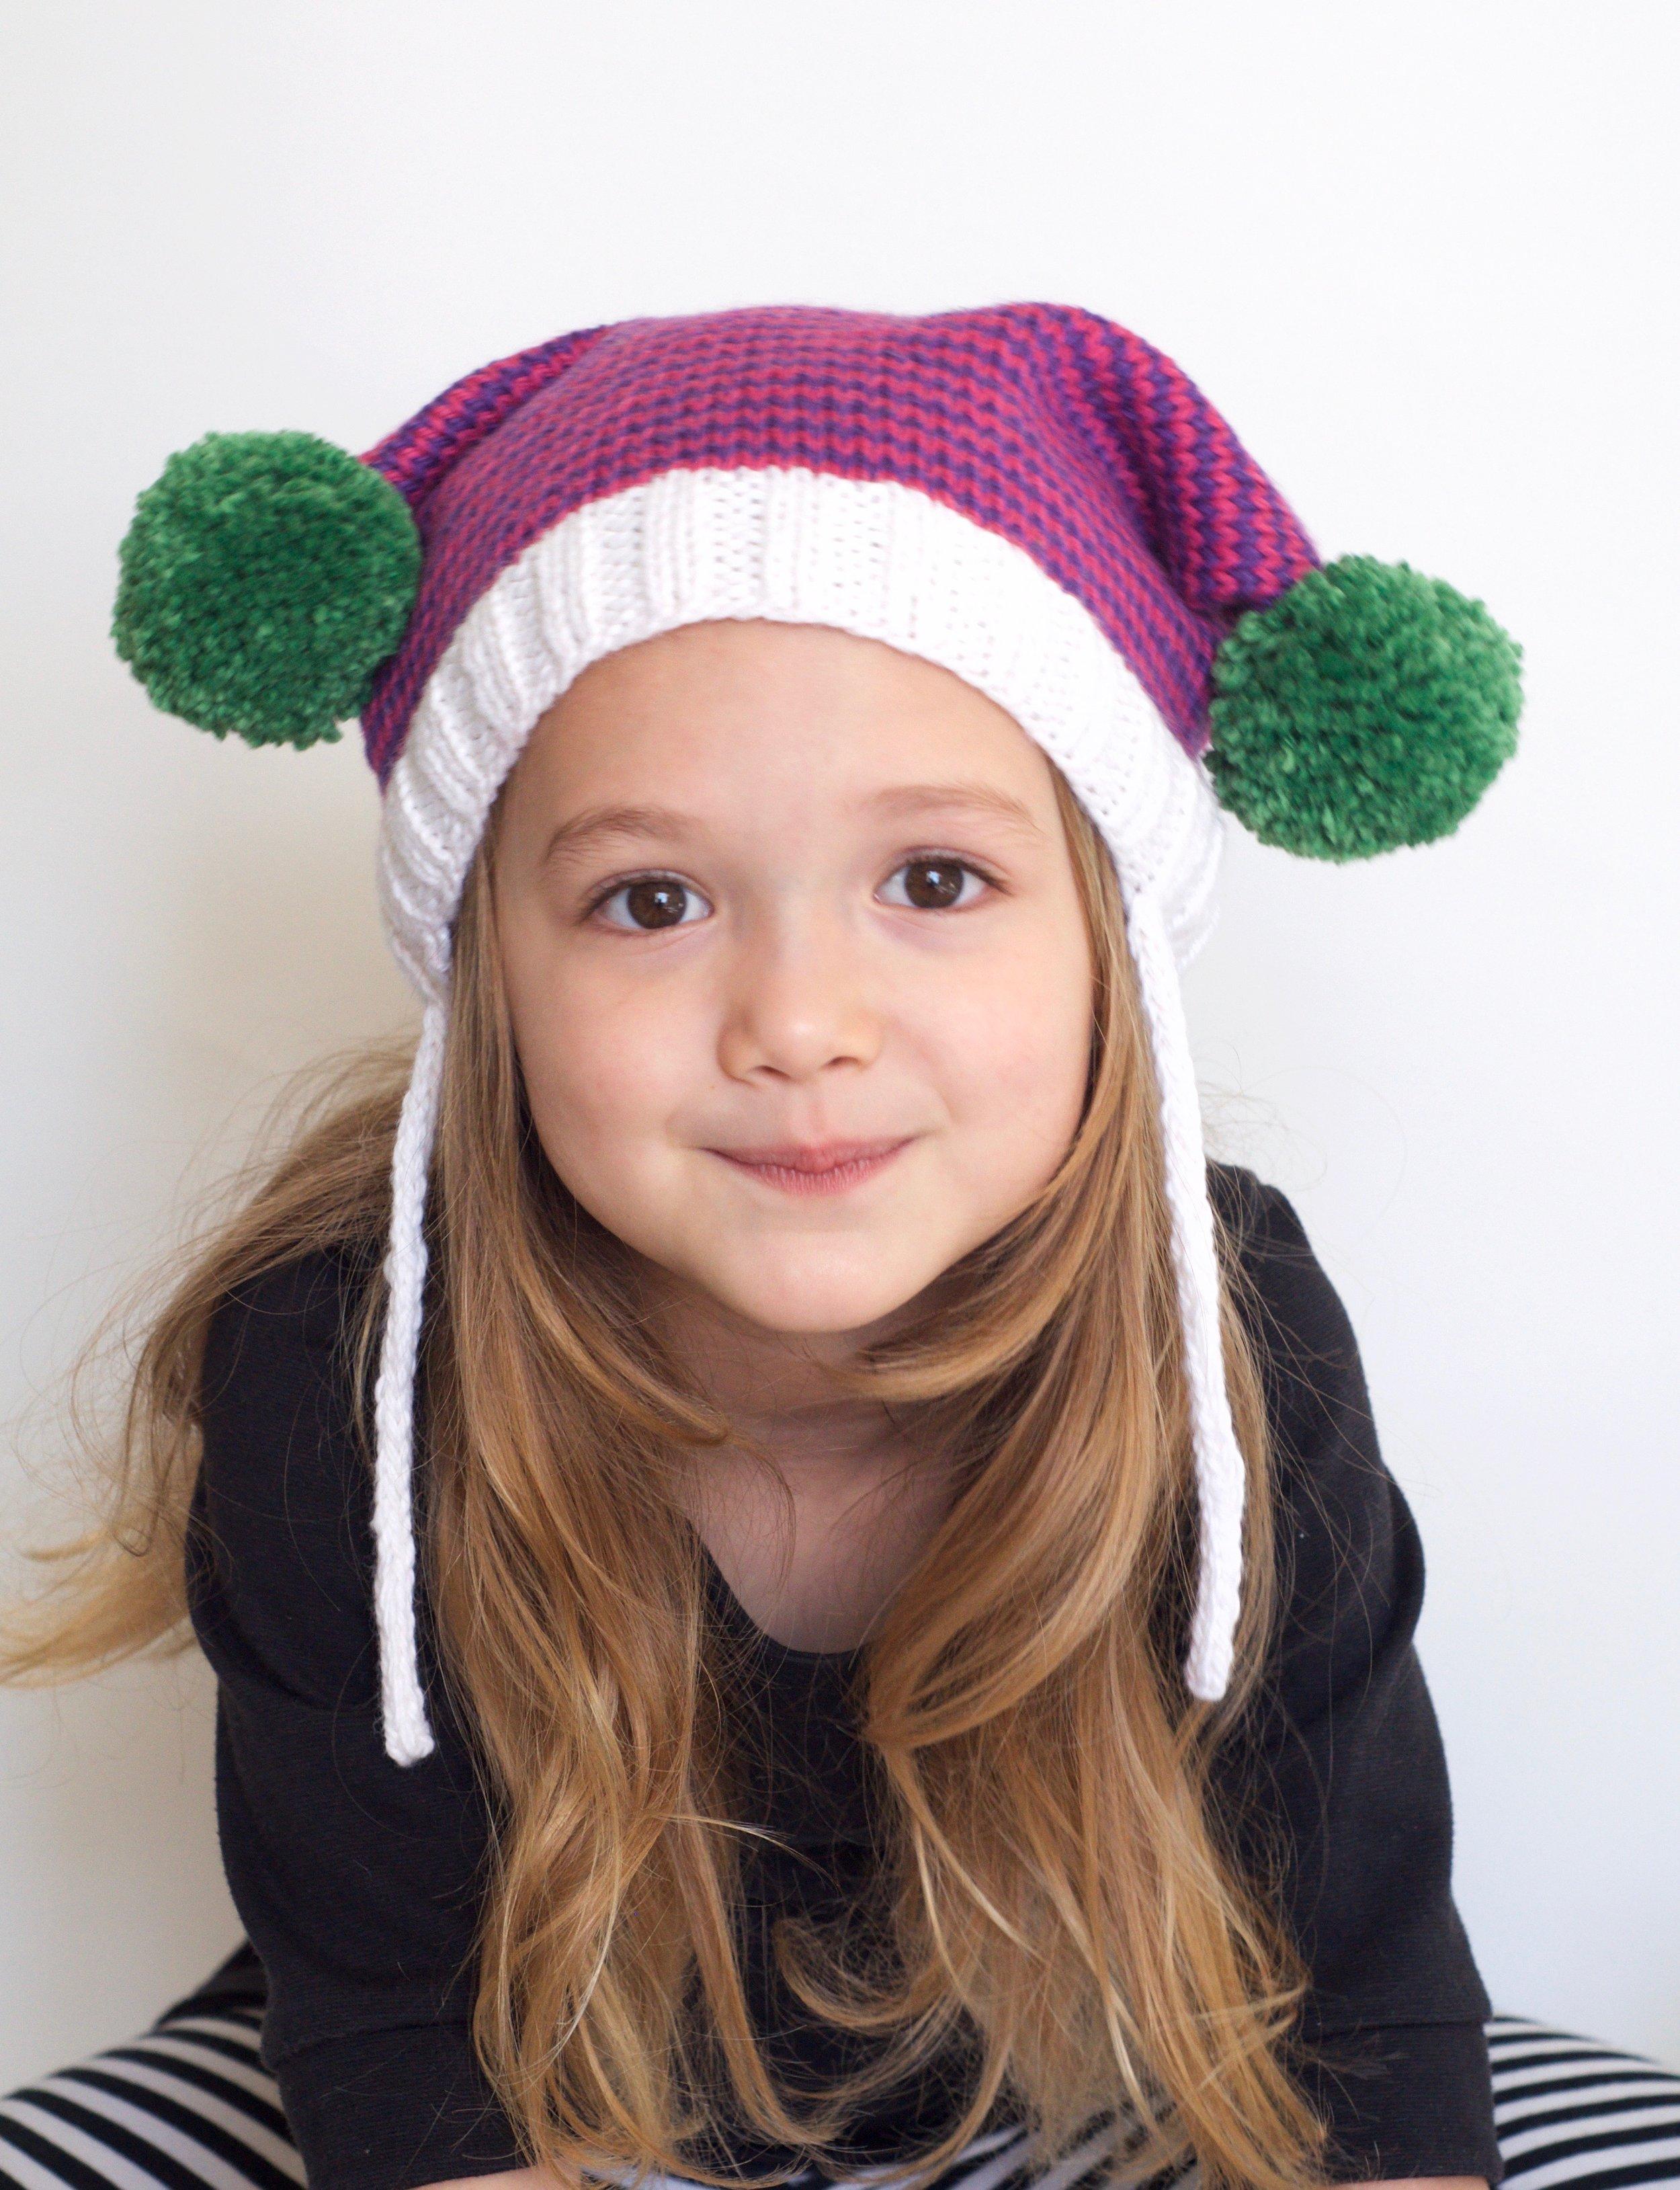 Mrs. Claus Boxy Hat